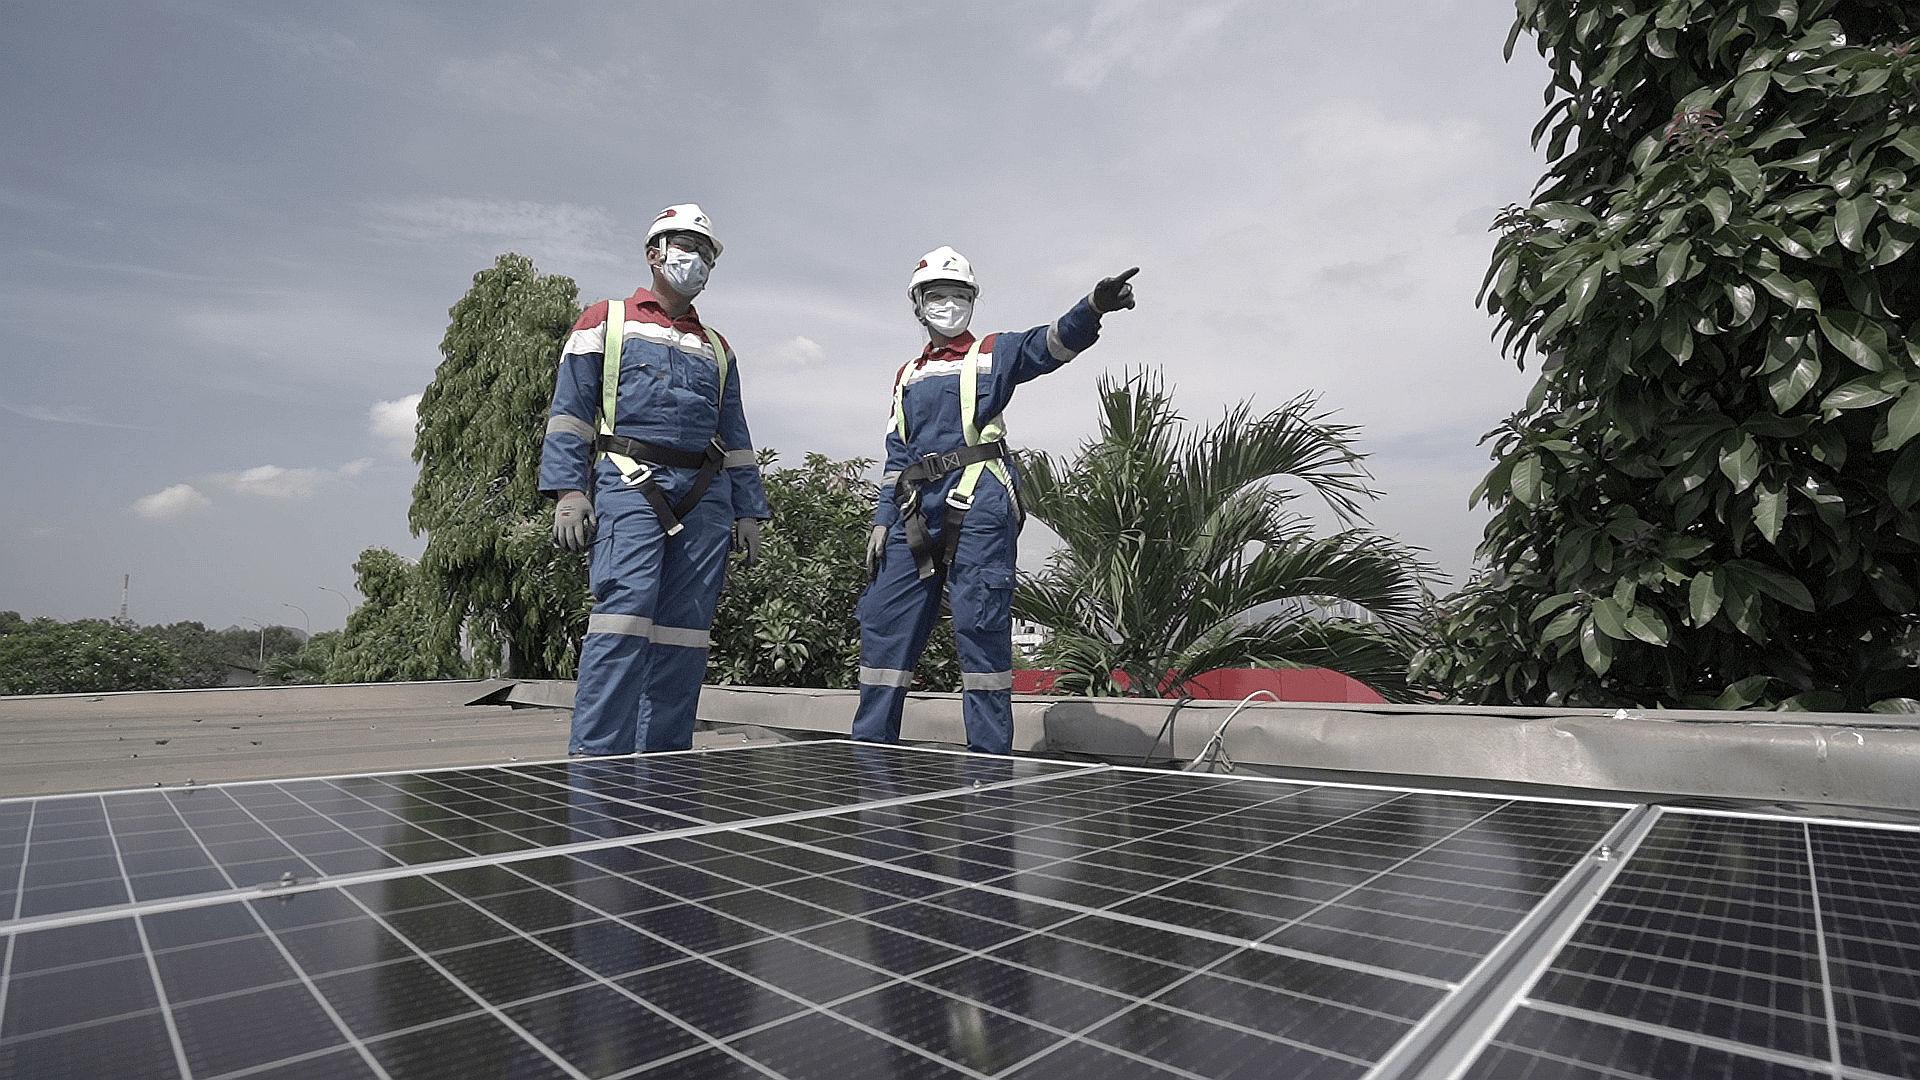 Menghemat Rp4 Miliar Setahun, Pertamina Target 5.000 SPBU Pasang PLTS Atap